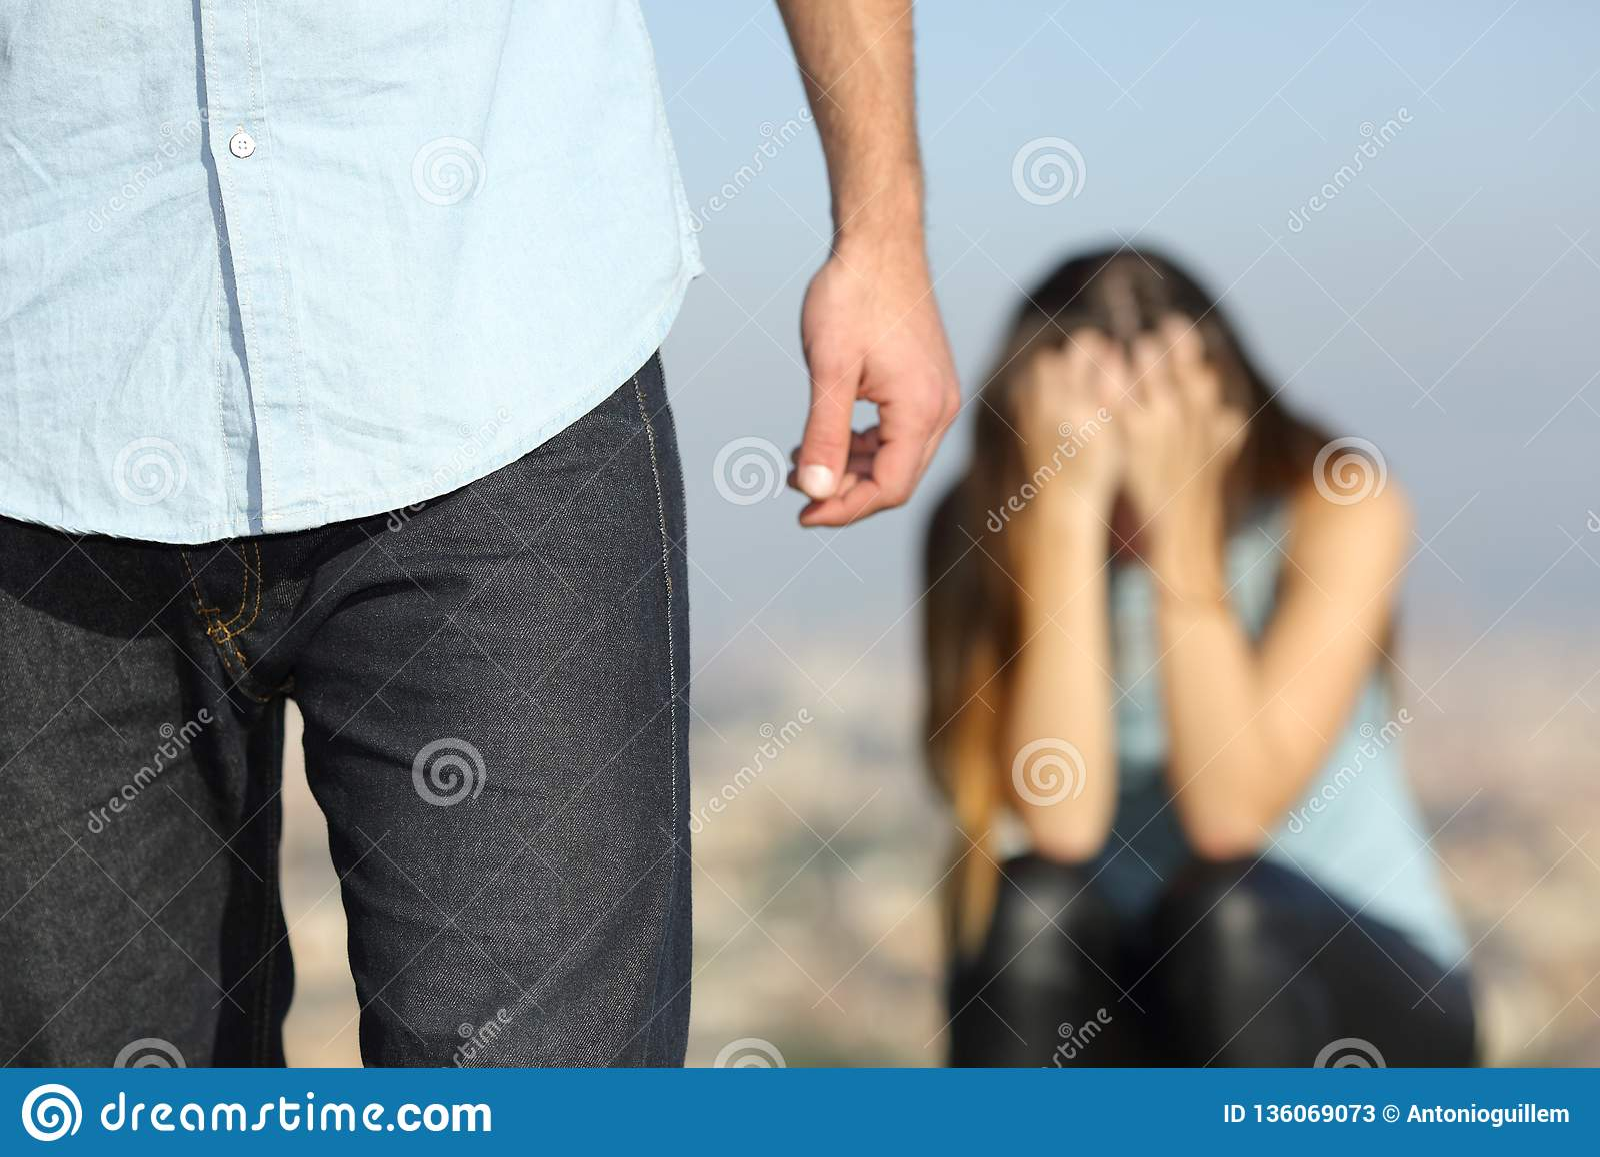 Sad woman complaining outdoors after break up